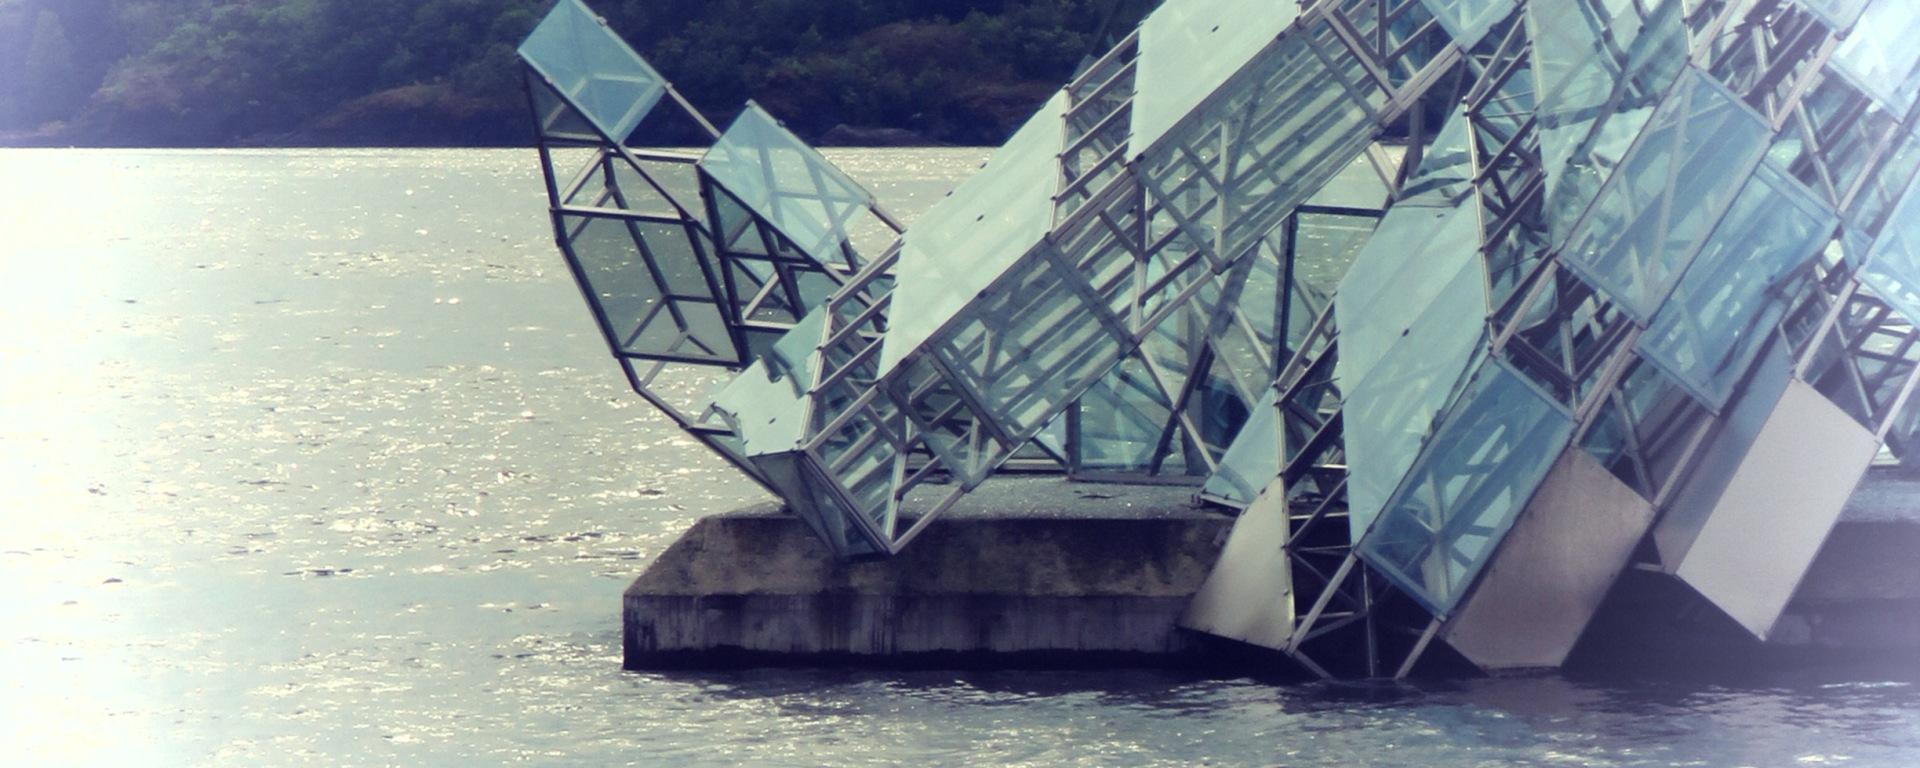 The Iceberg of Oslo's Opera House. Read More at www.beautifulfillment.com